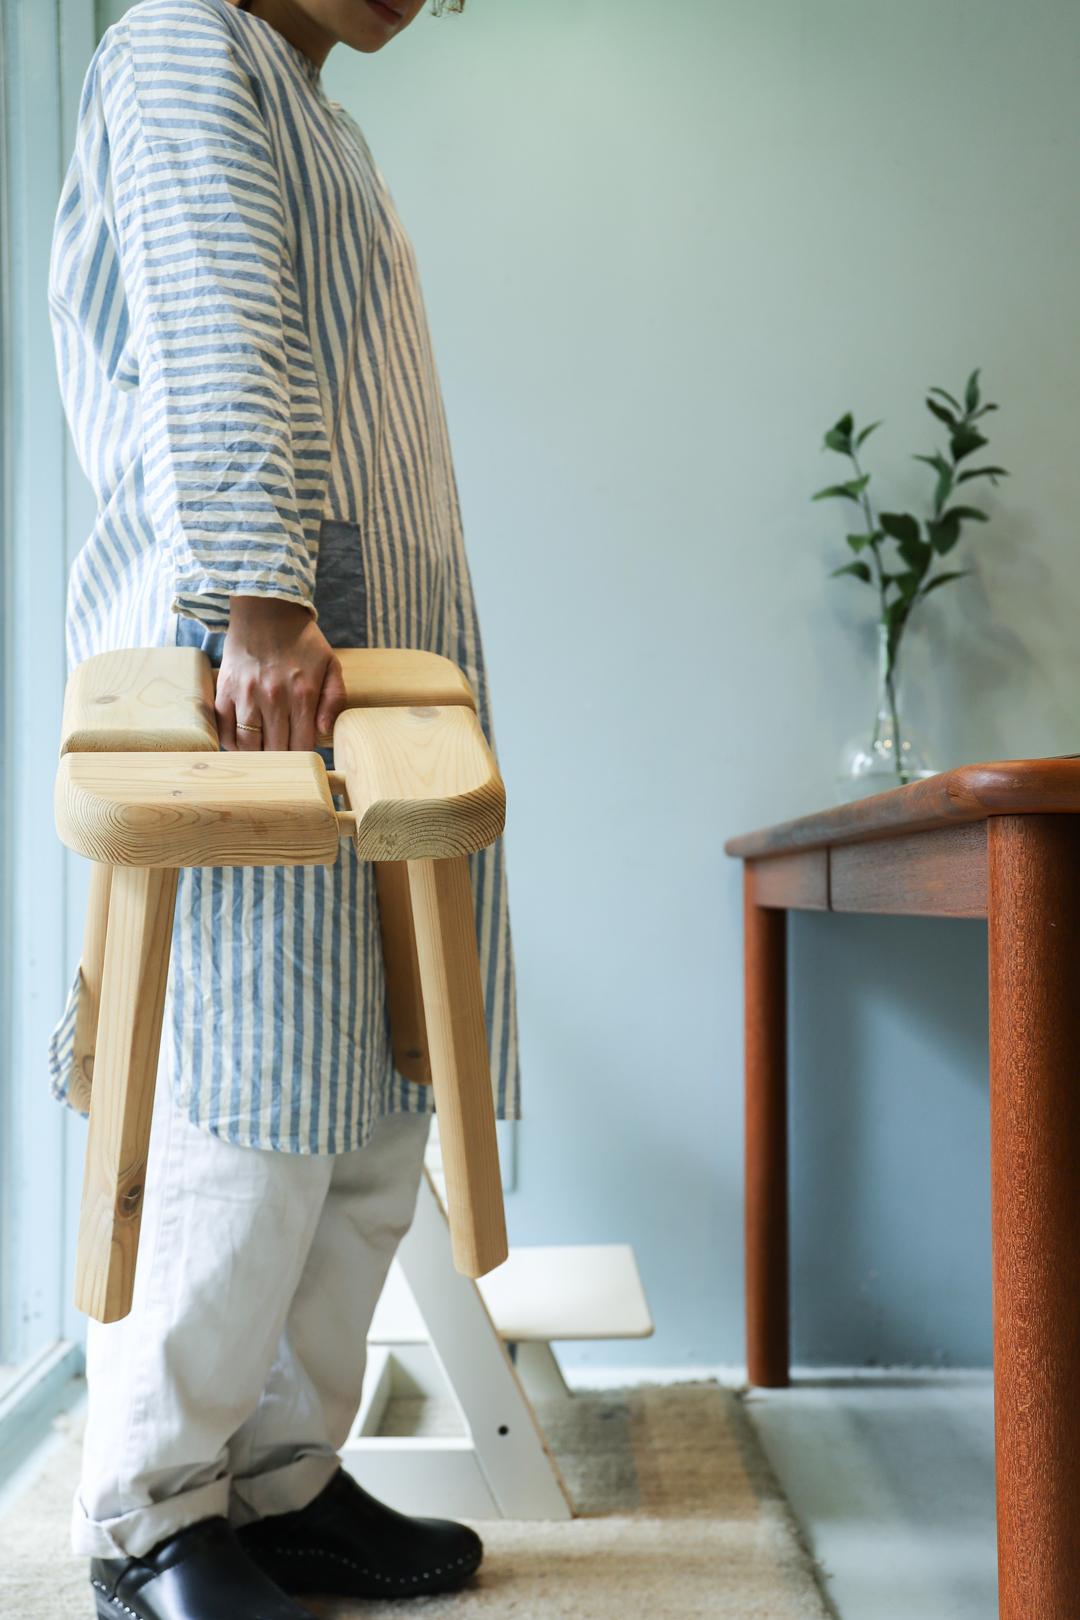 Finnish Vintage Pinewood Stool/フィンランド ヴィンテージ スツール 椅子 パイン材 北欧家具